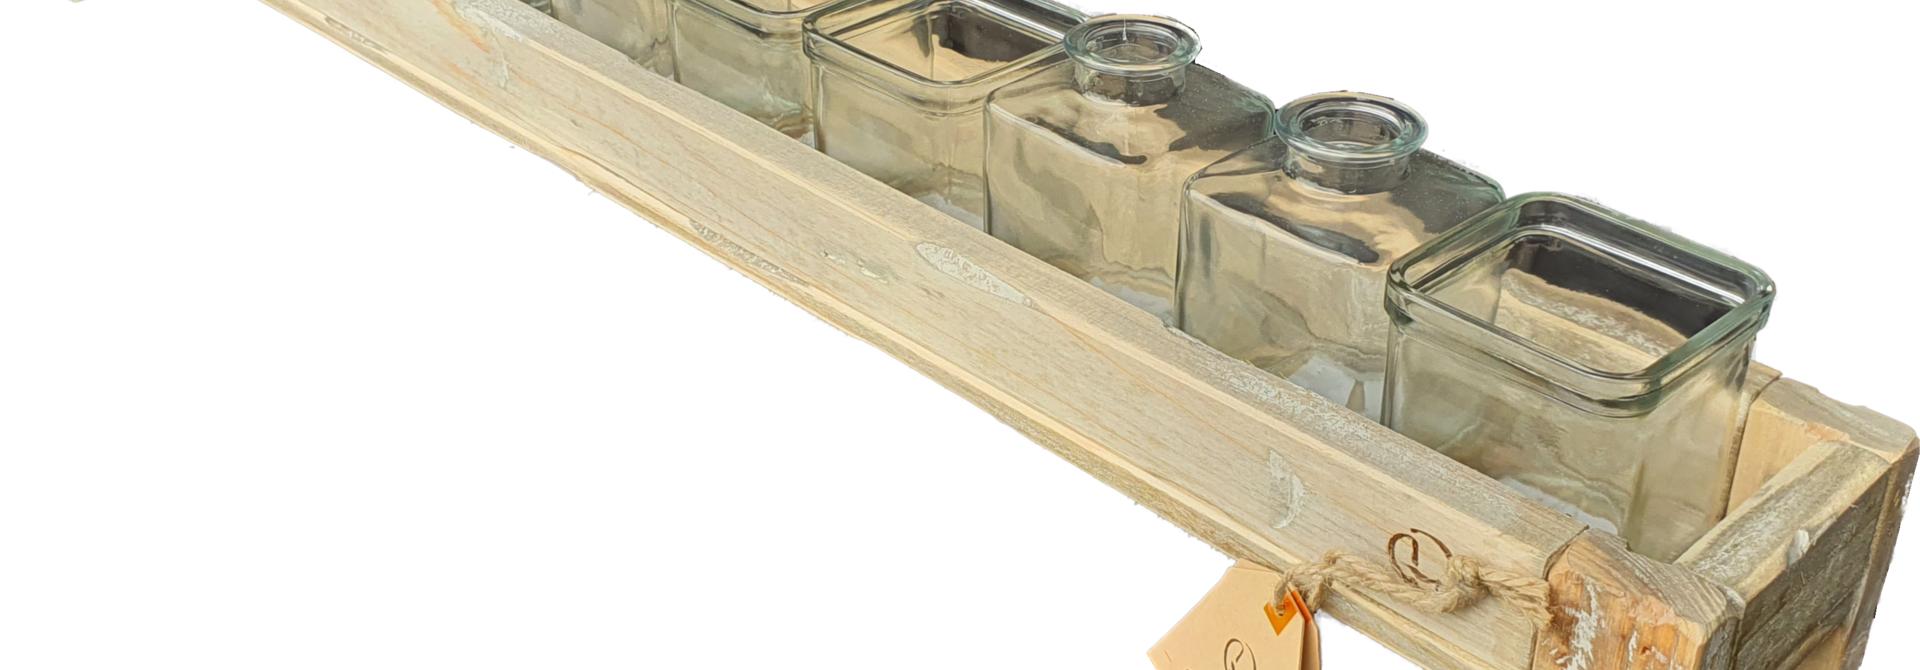 tray old dutch glass hold narrow 95